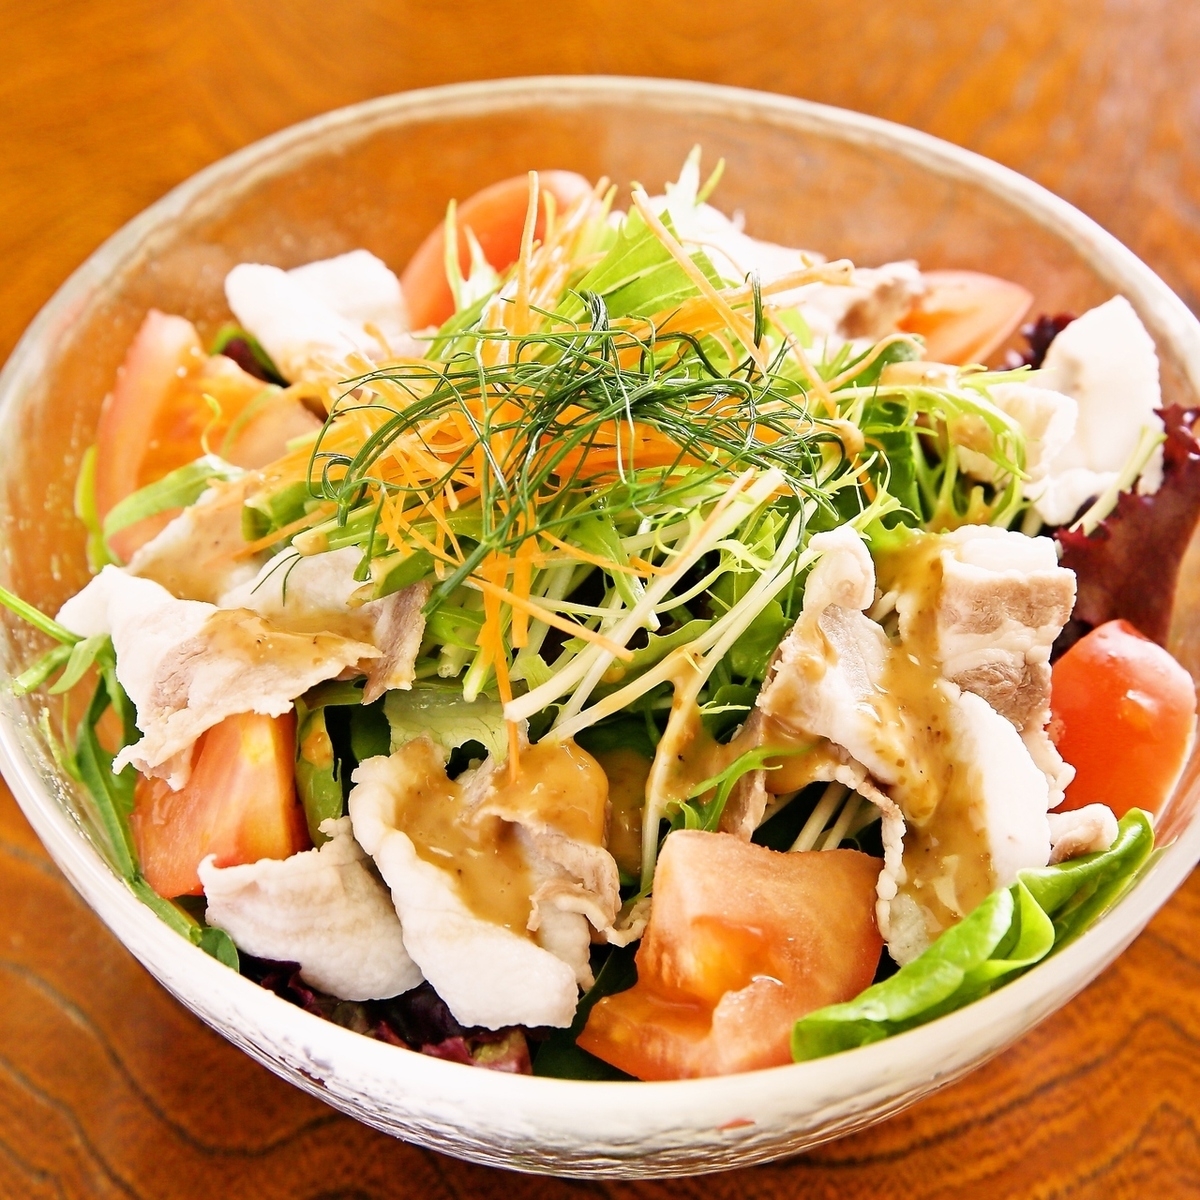 Yanbare岛猪的冷涮沙拉